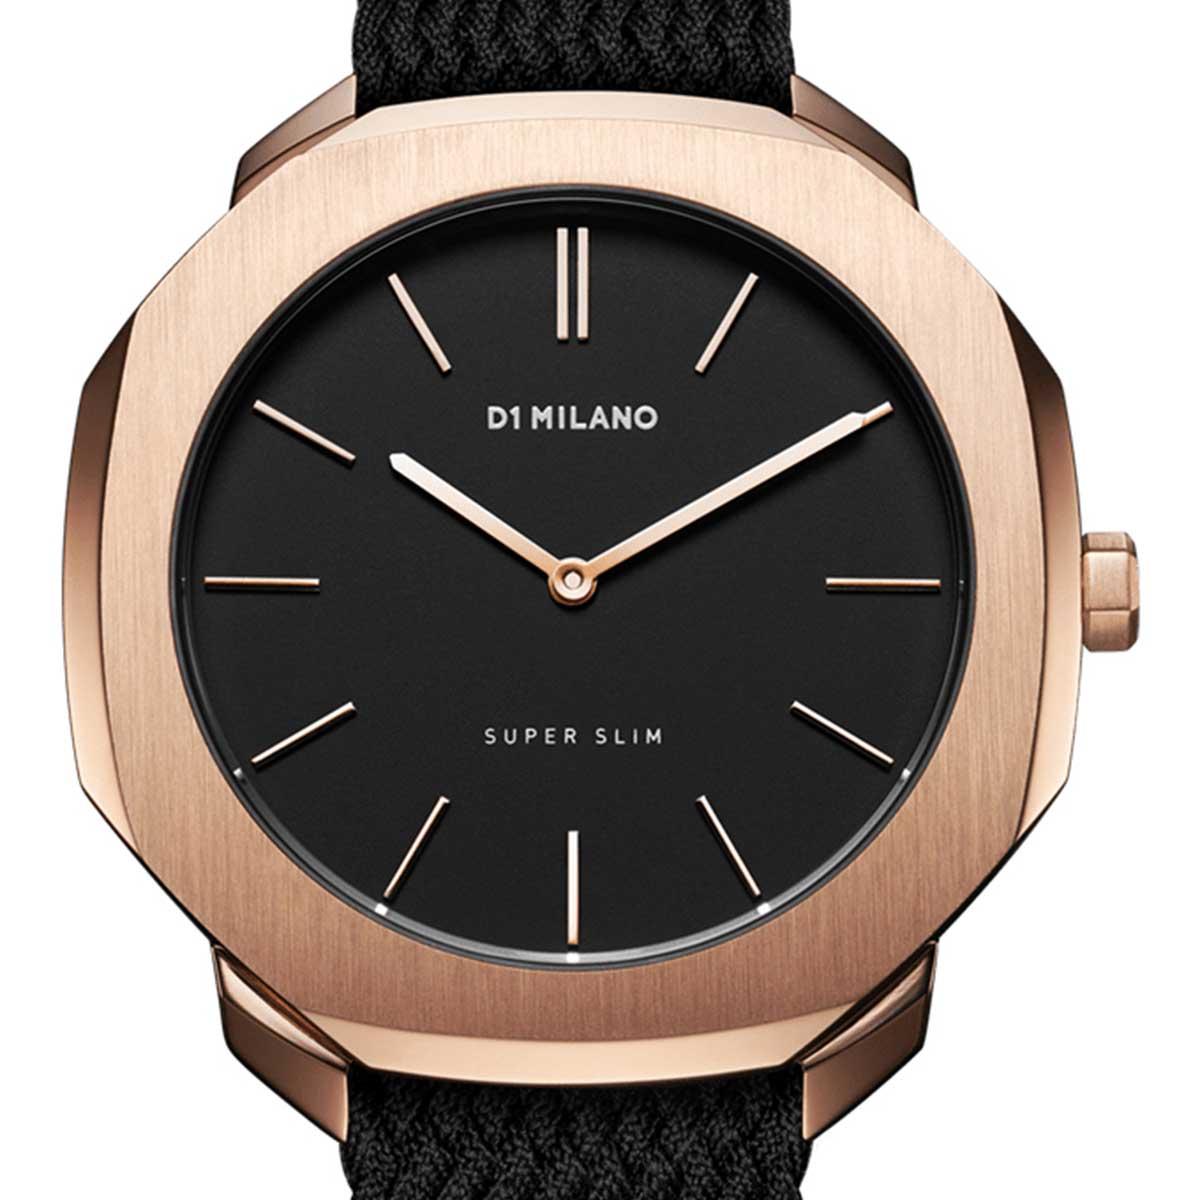 D1 MILANO ディーワンミラノ 電池式クォーツ 腕時計 [SSPJ02] 並行輸入品